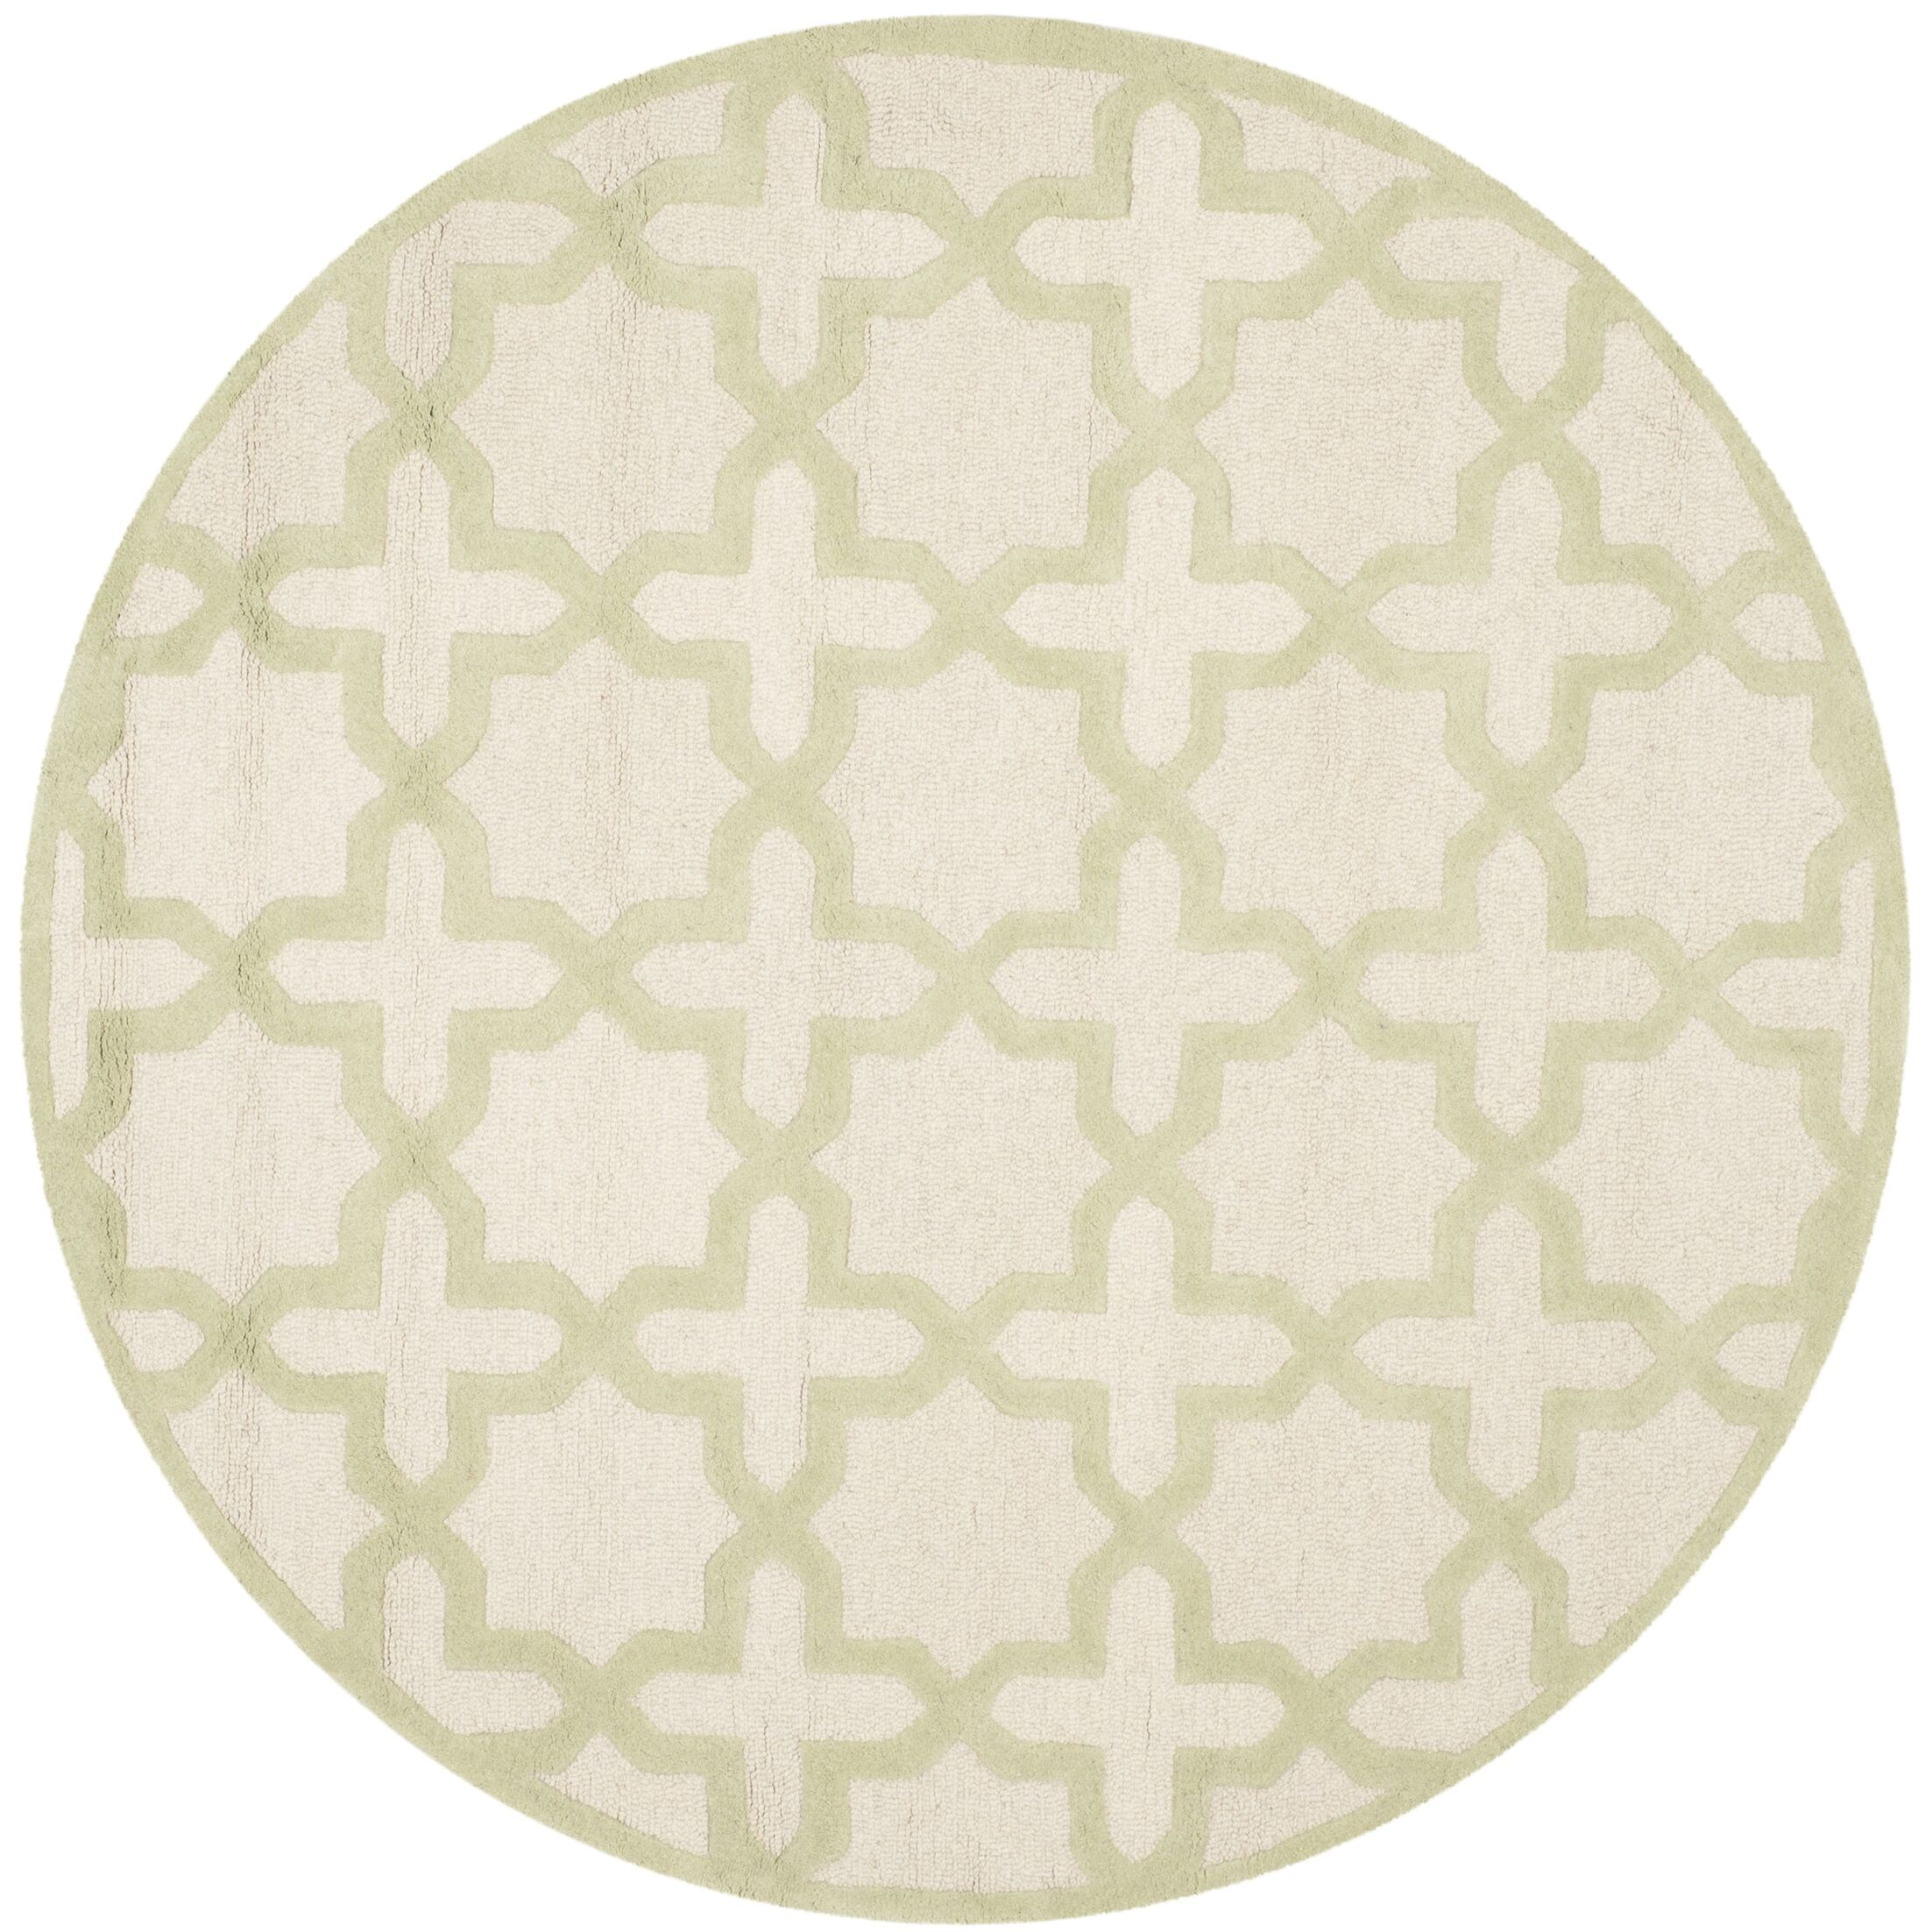 Martins Ivory / Light Green Area Rug Rug Size: Round 6'